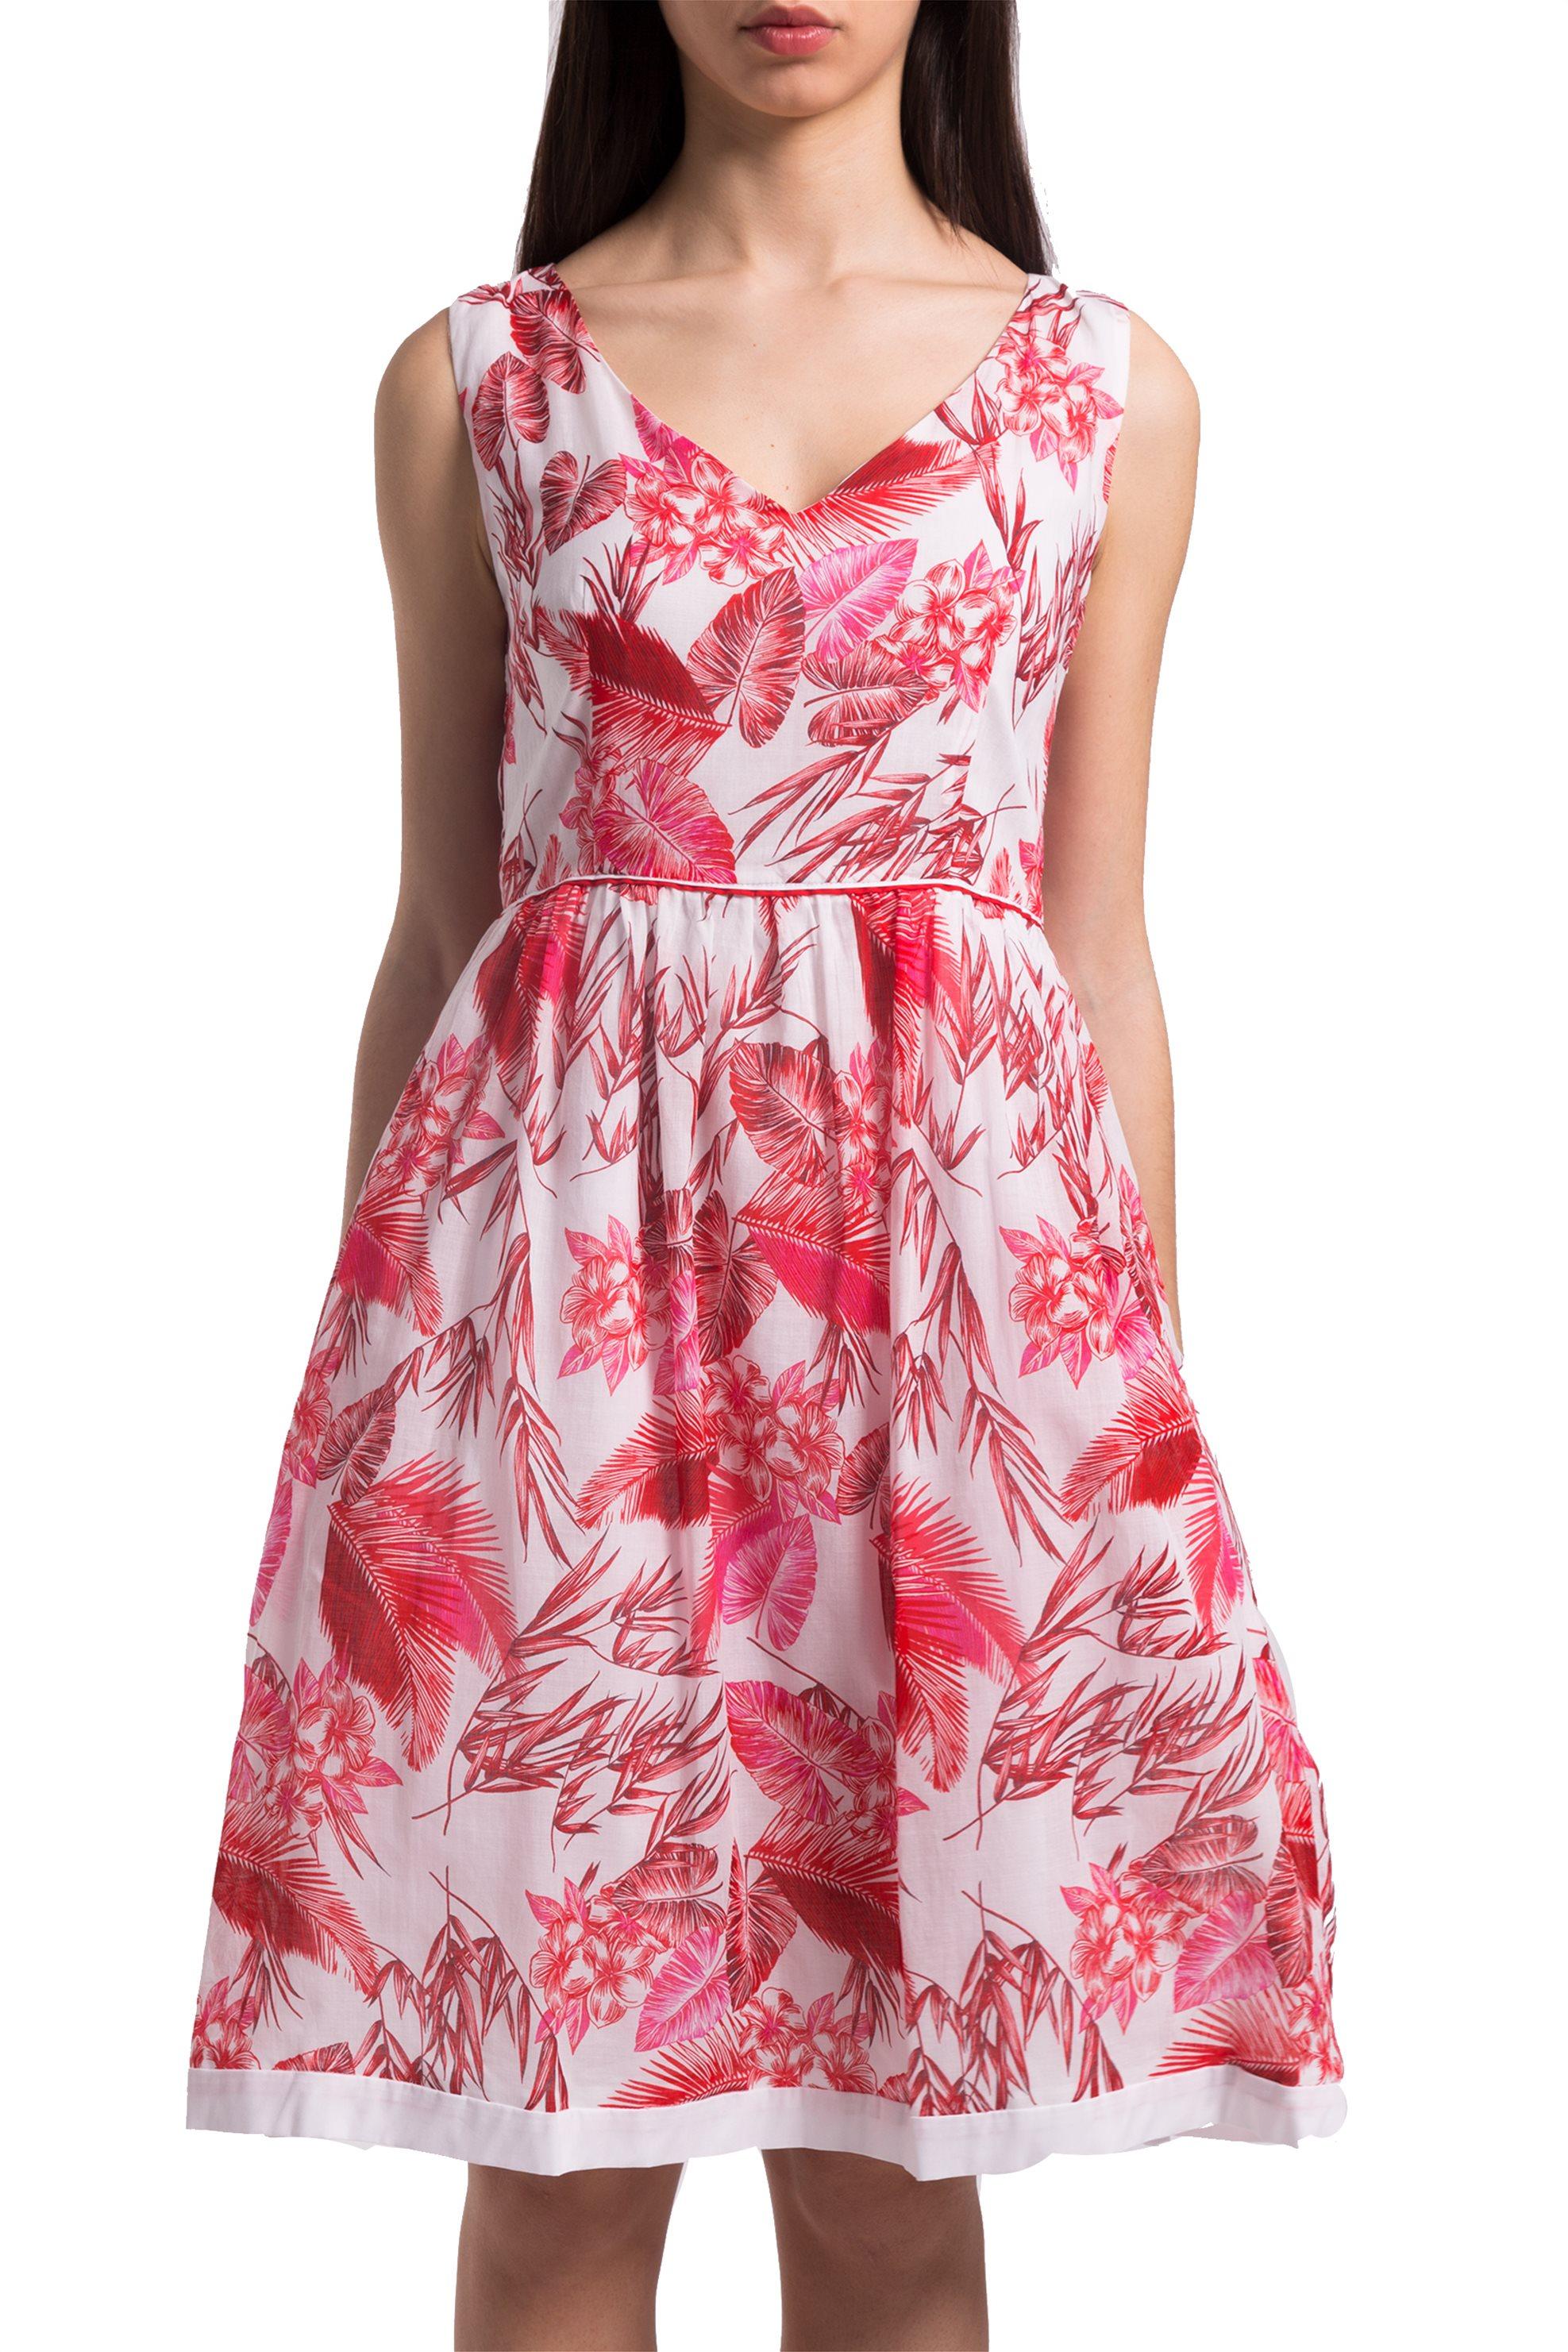 0b65125487fc Γυναικεία   Ρούχα   Φορέματα   Midi Κρεπ Φόρεμα με Open Cuts στη ...